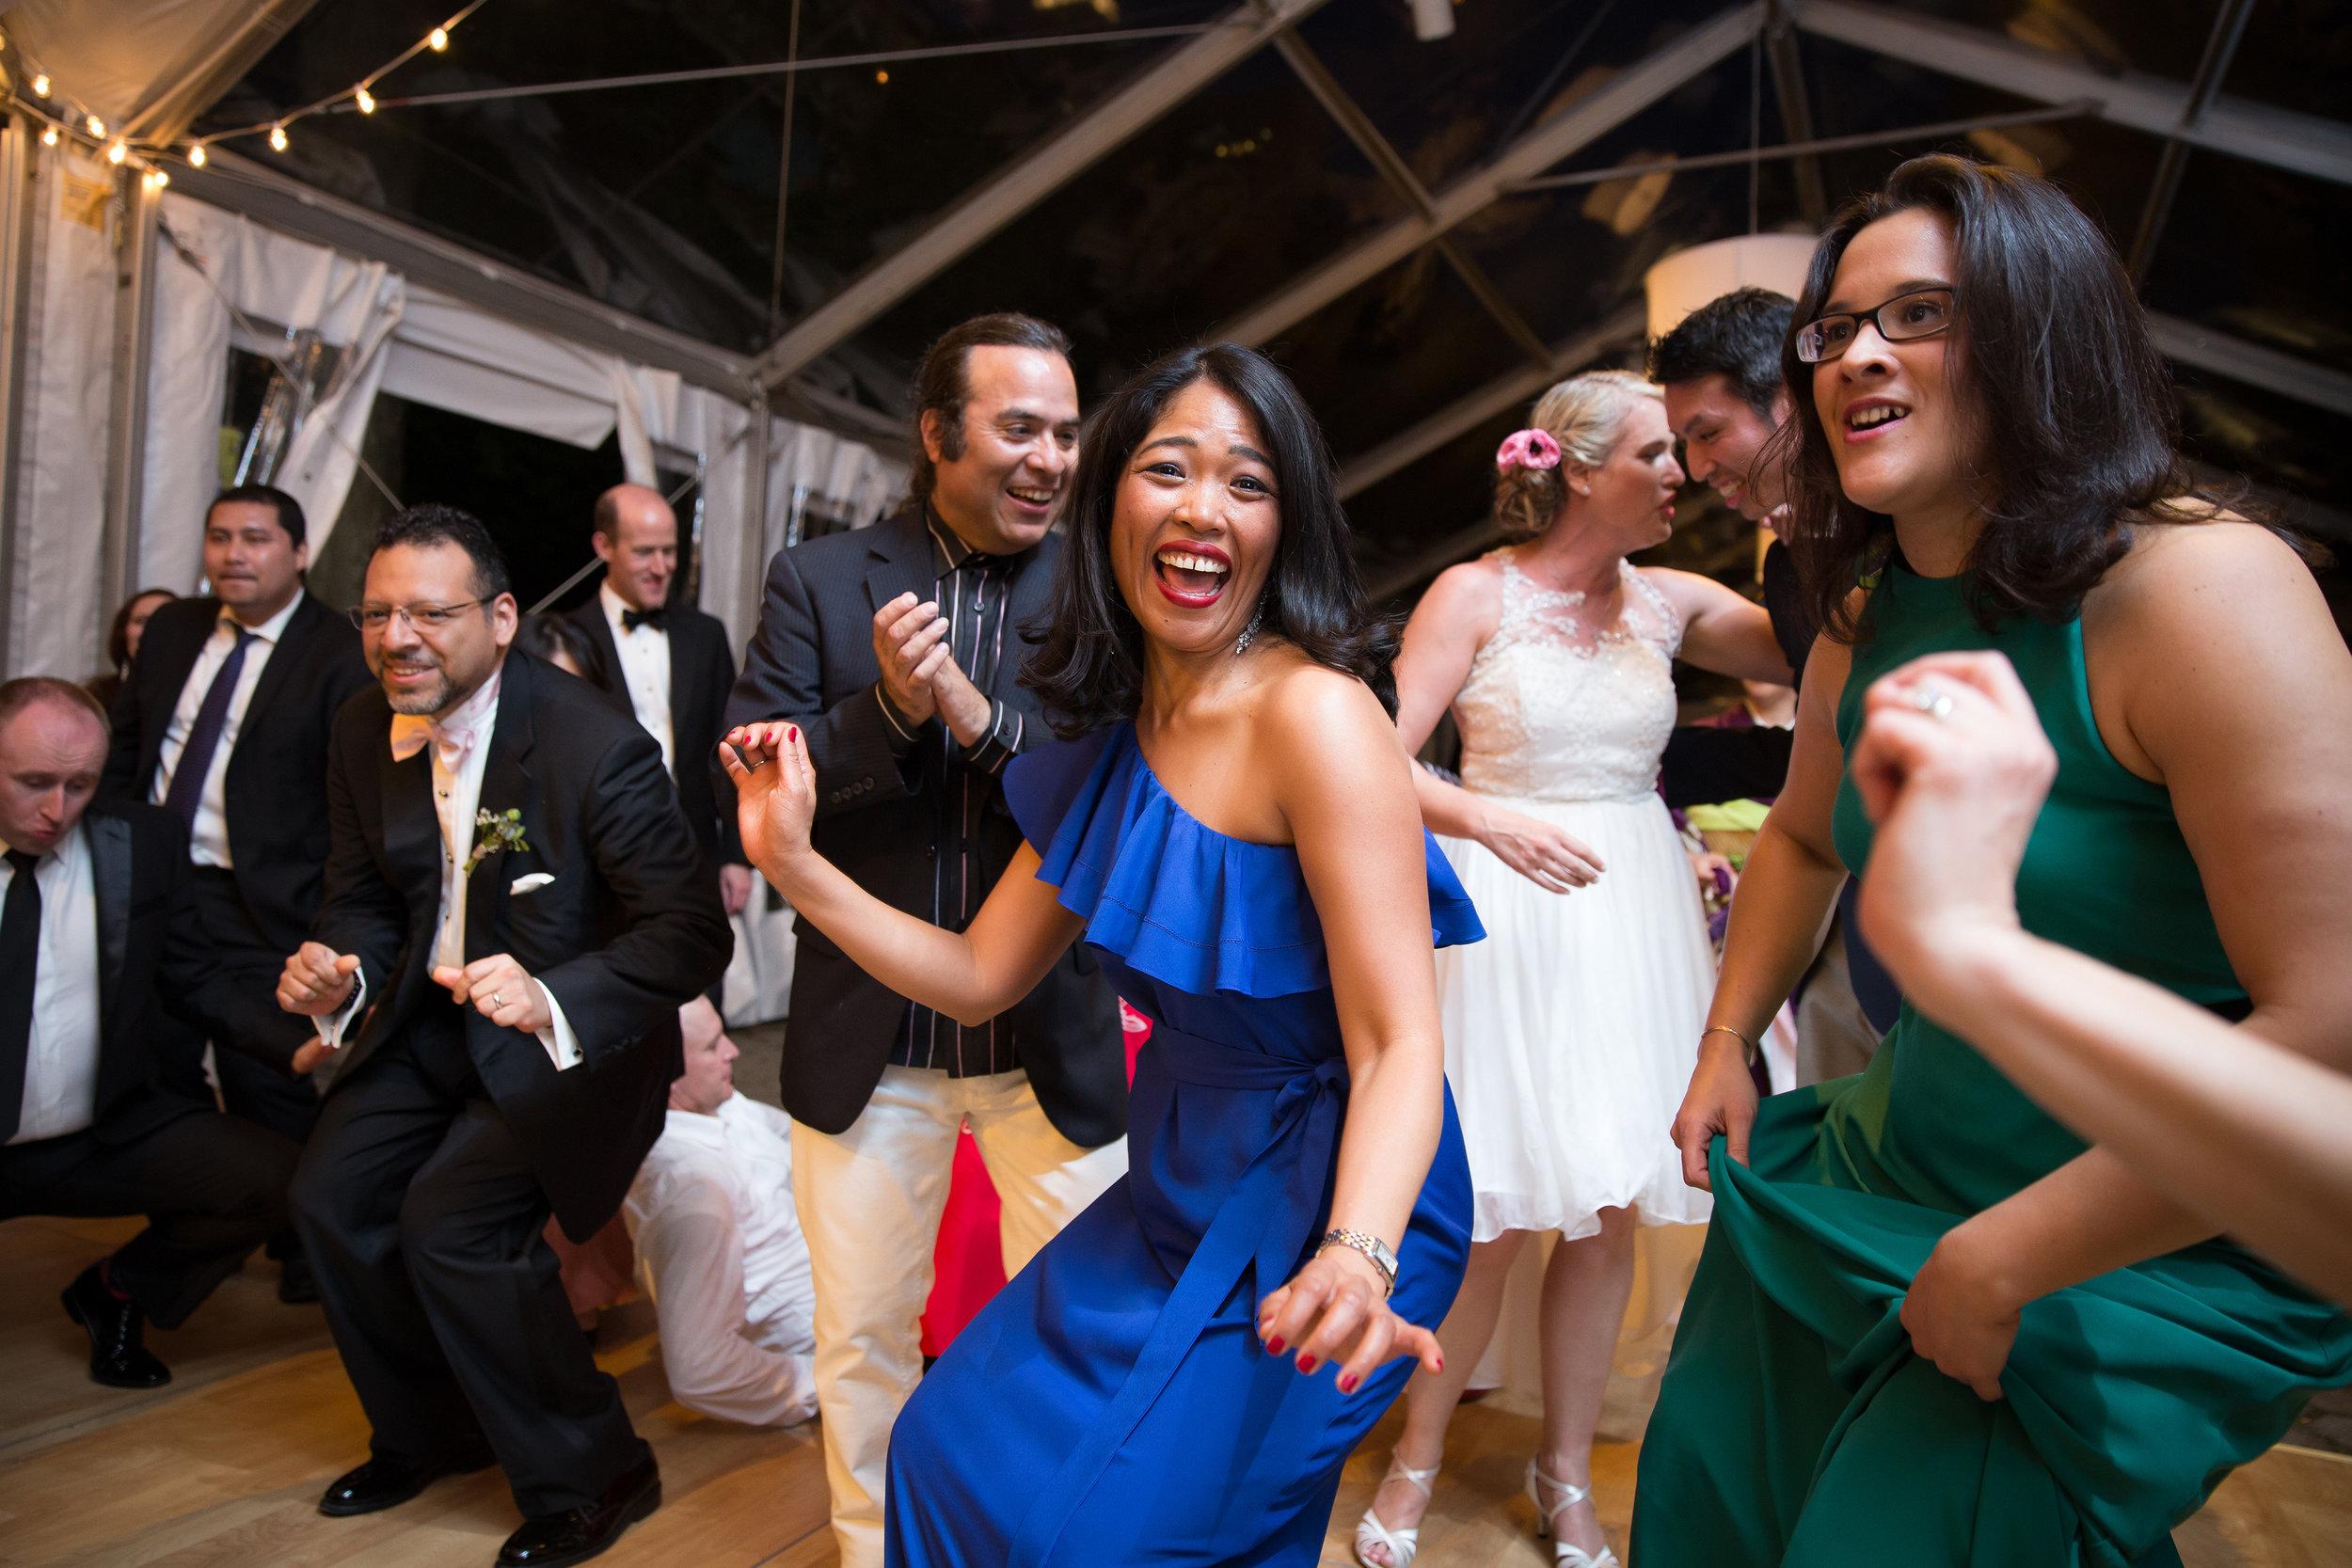 victorious-events-nyc-035-colleen-taka-central-park-zoo-wedding-raymond-hamlin.jpg